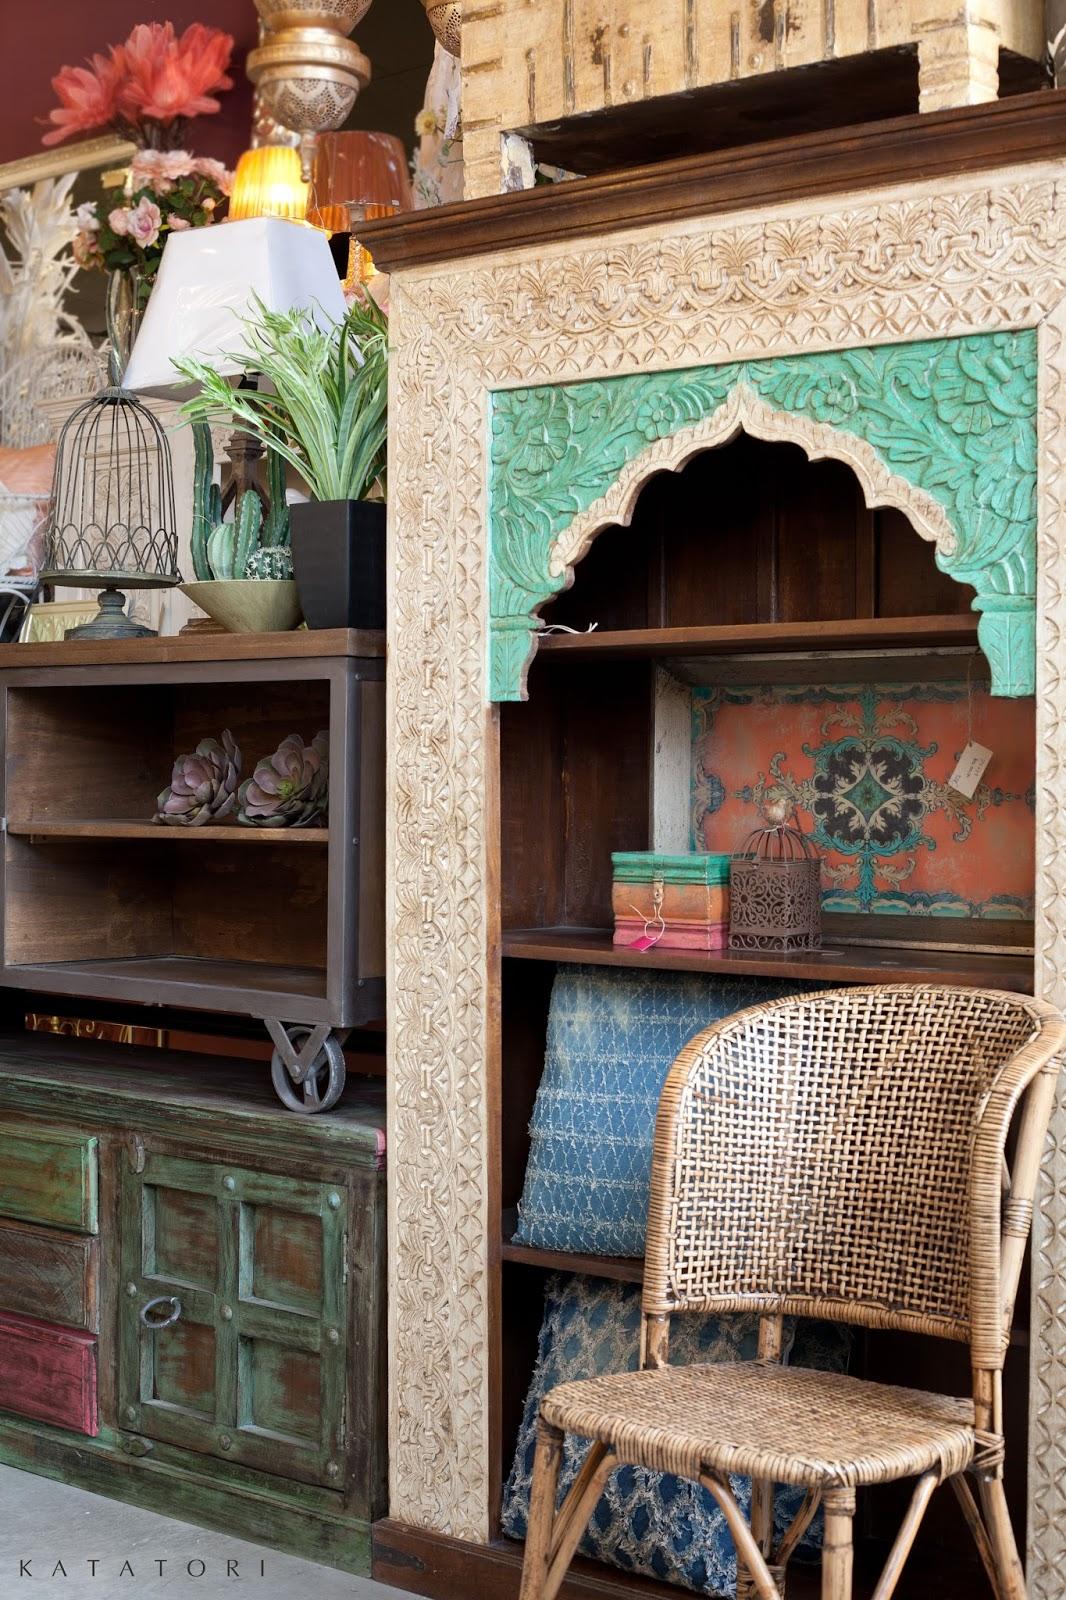 Katatori interiores ganas de decoraci n fresquita for Muebles poligono el manchon